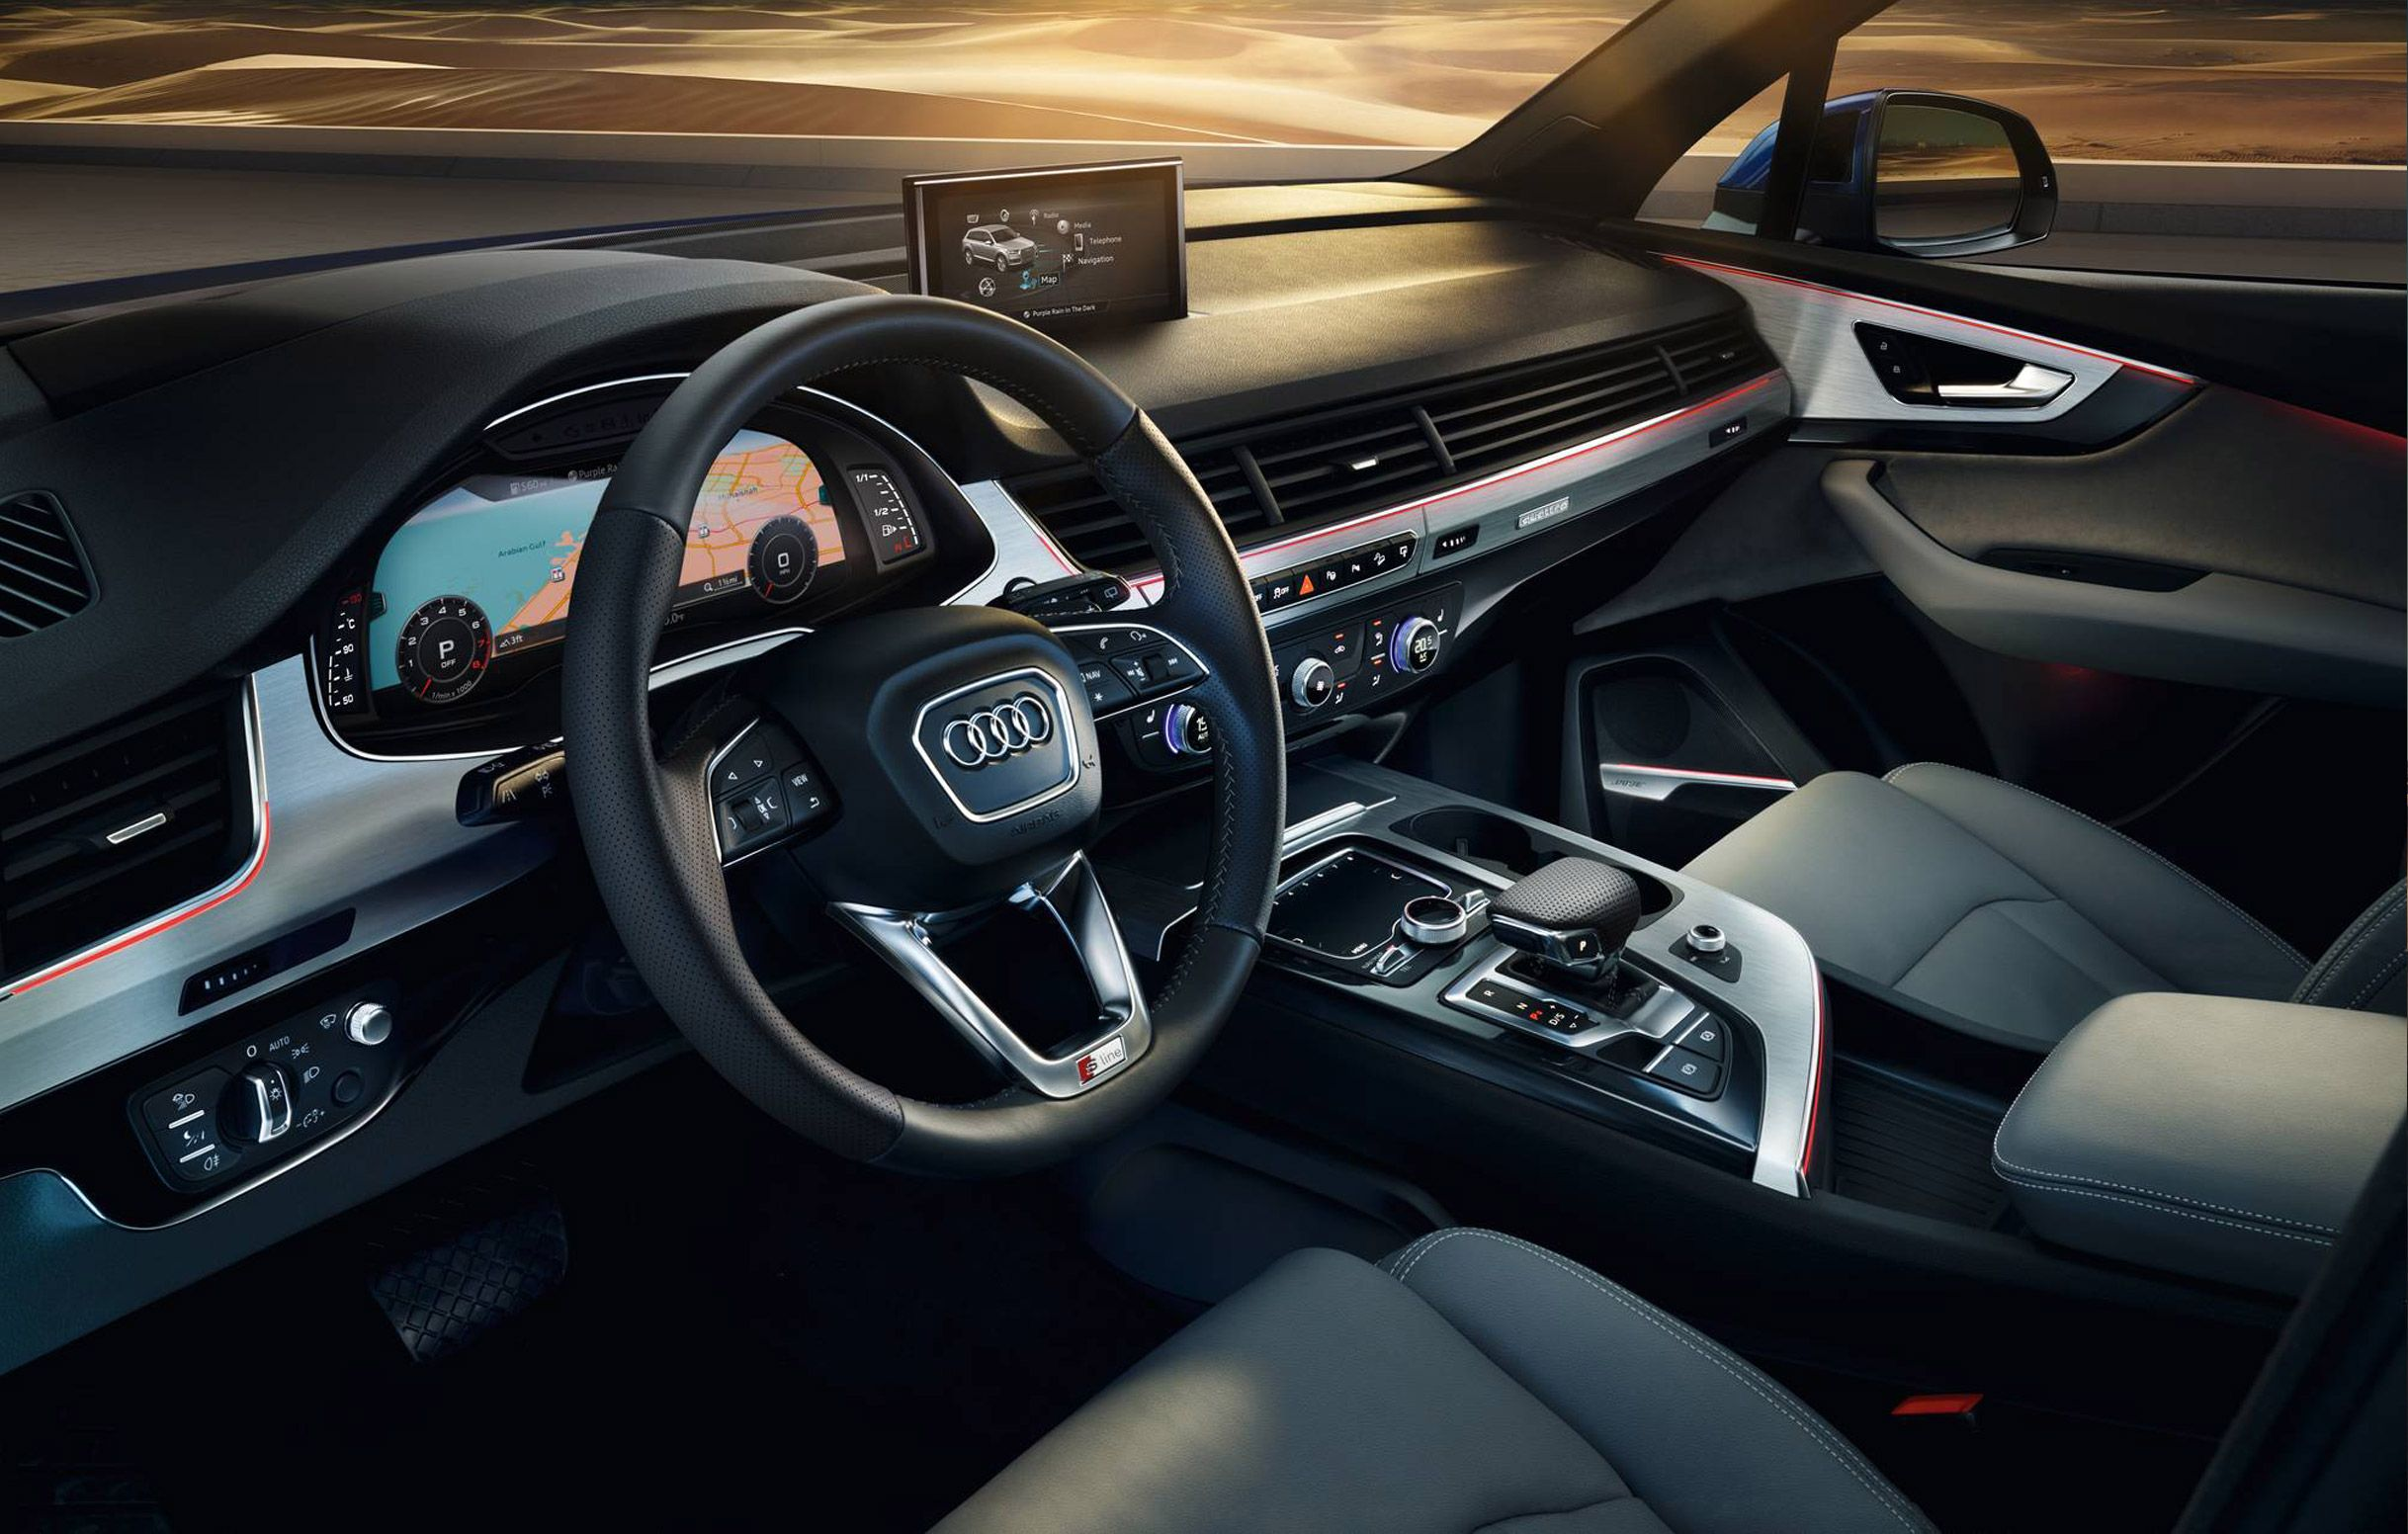 2017 audi q7 30t quattro cockpit car audi concepts pinterest audi q7 audi and cars